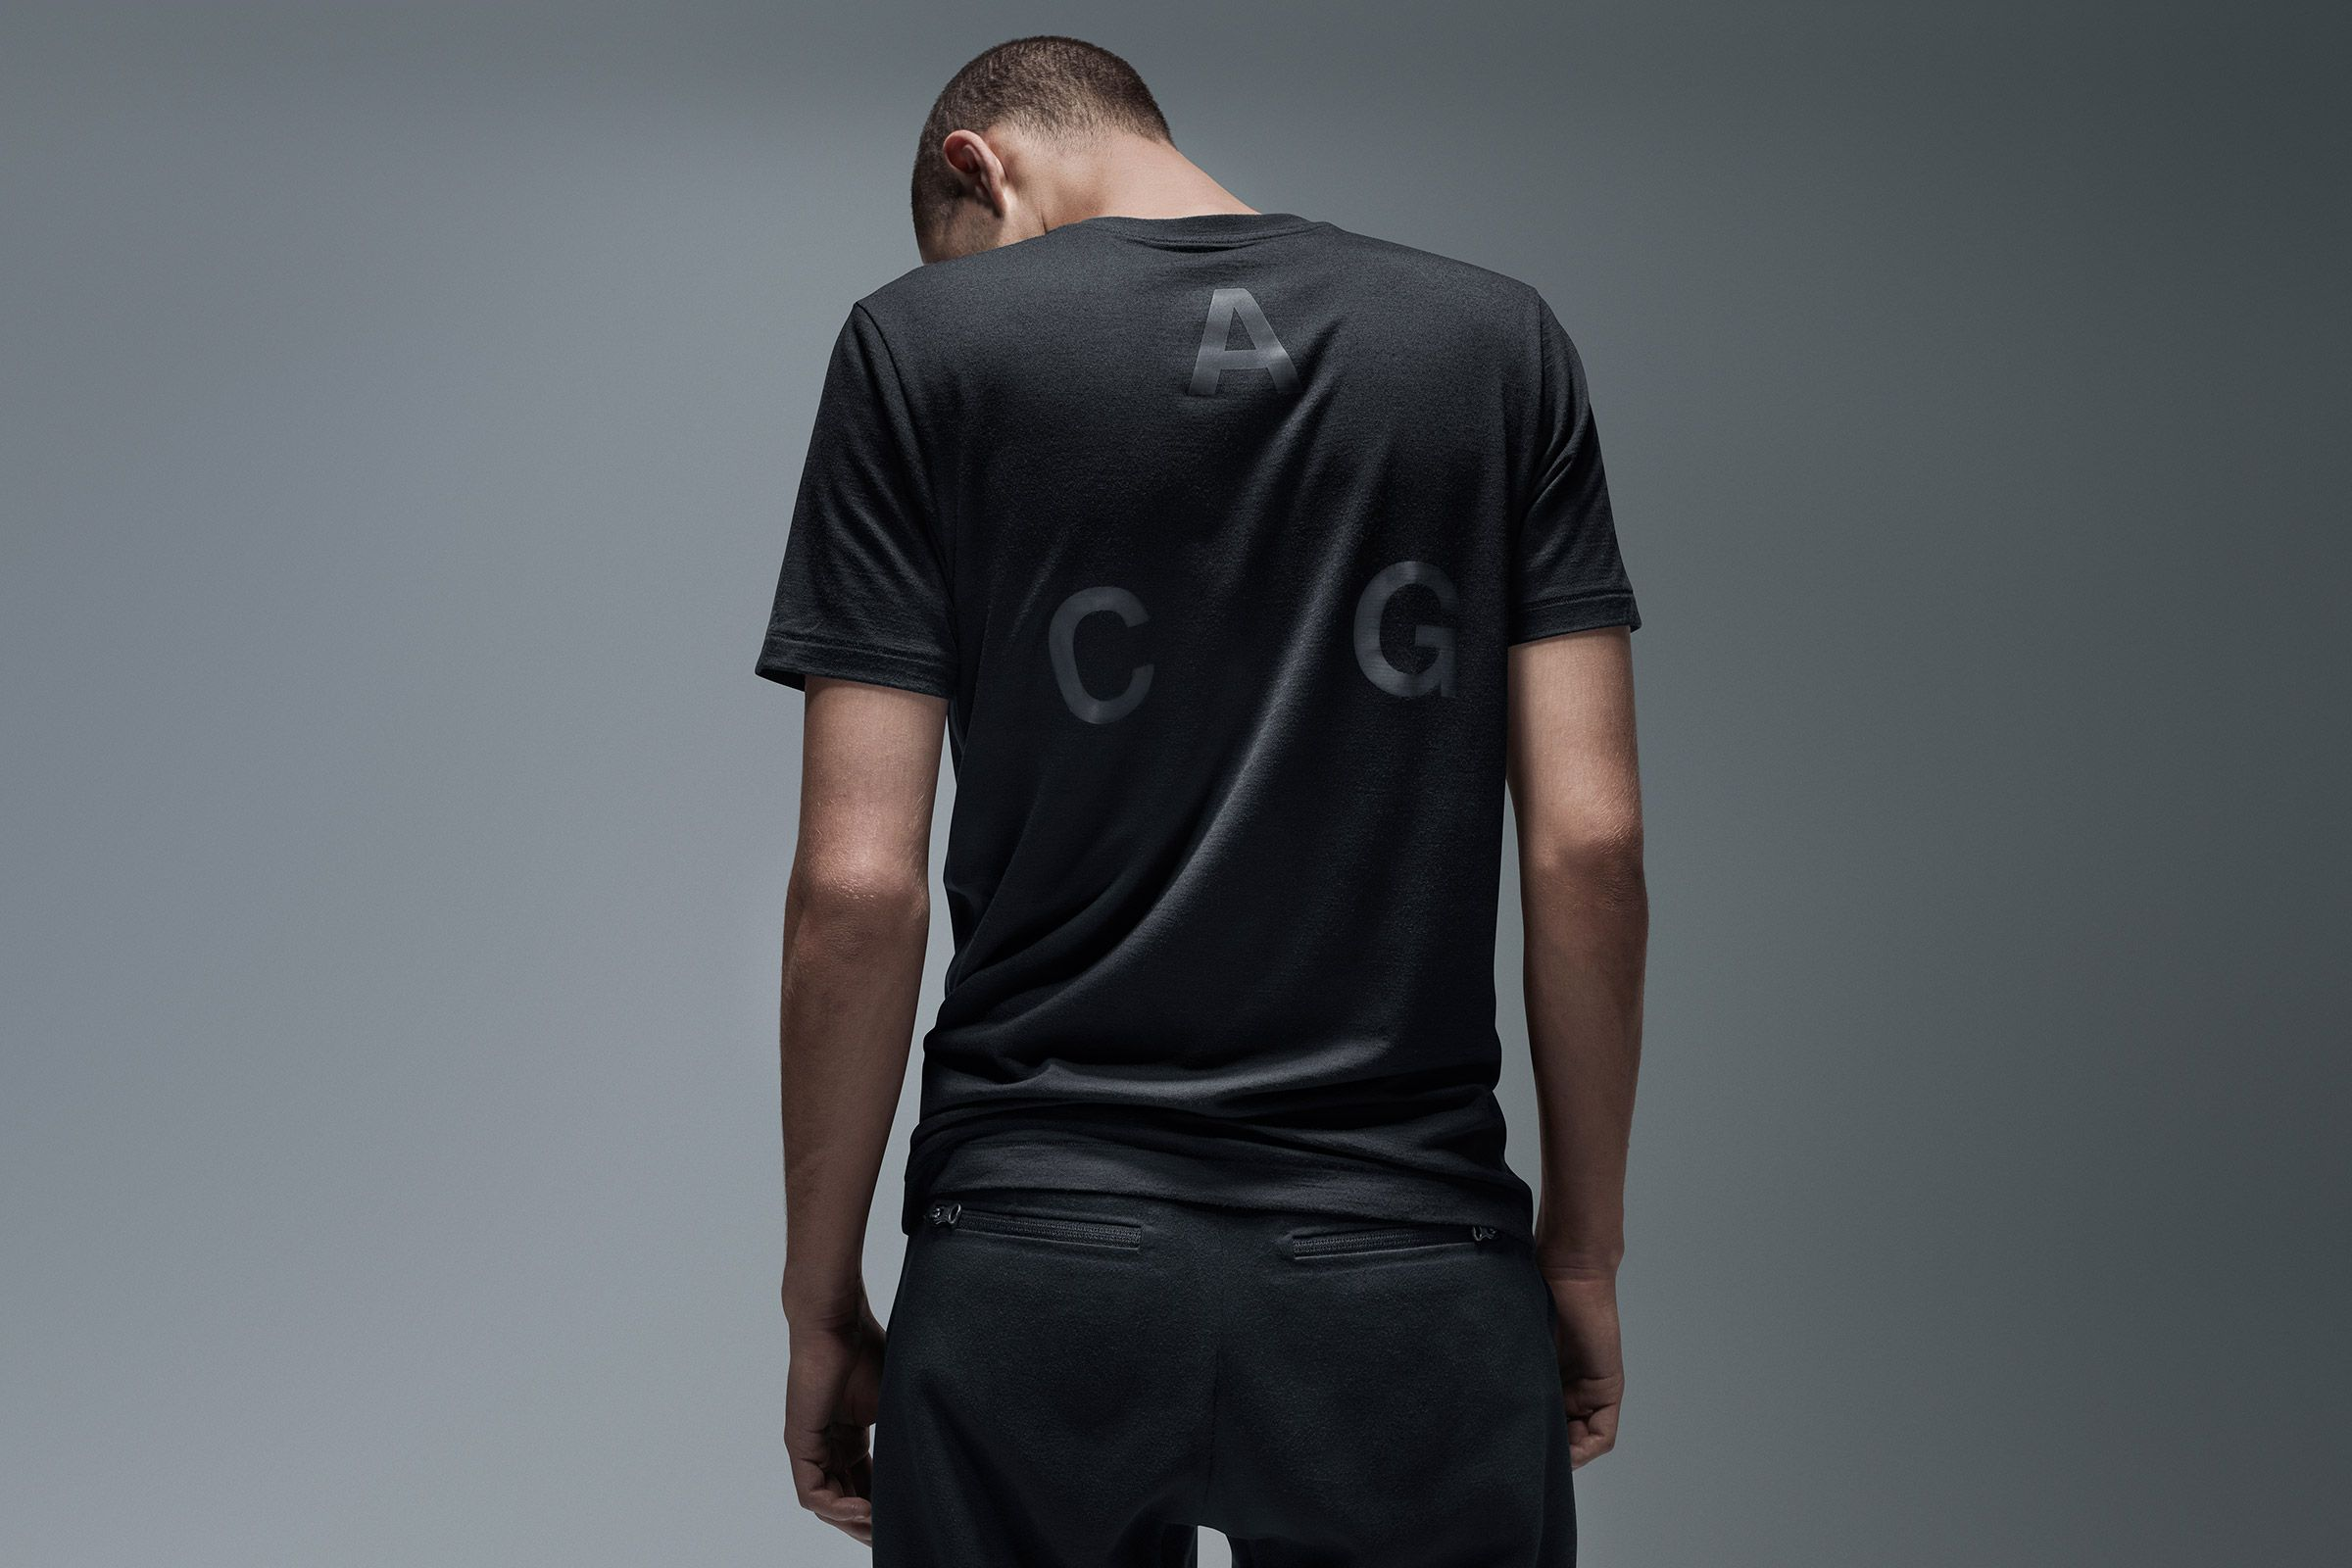 NikeLab 2014 ACG Apparel Collection Nike Fashion dab3053538d52